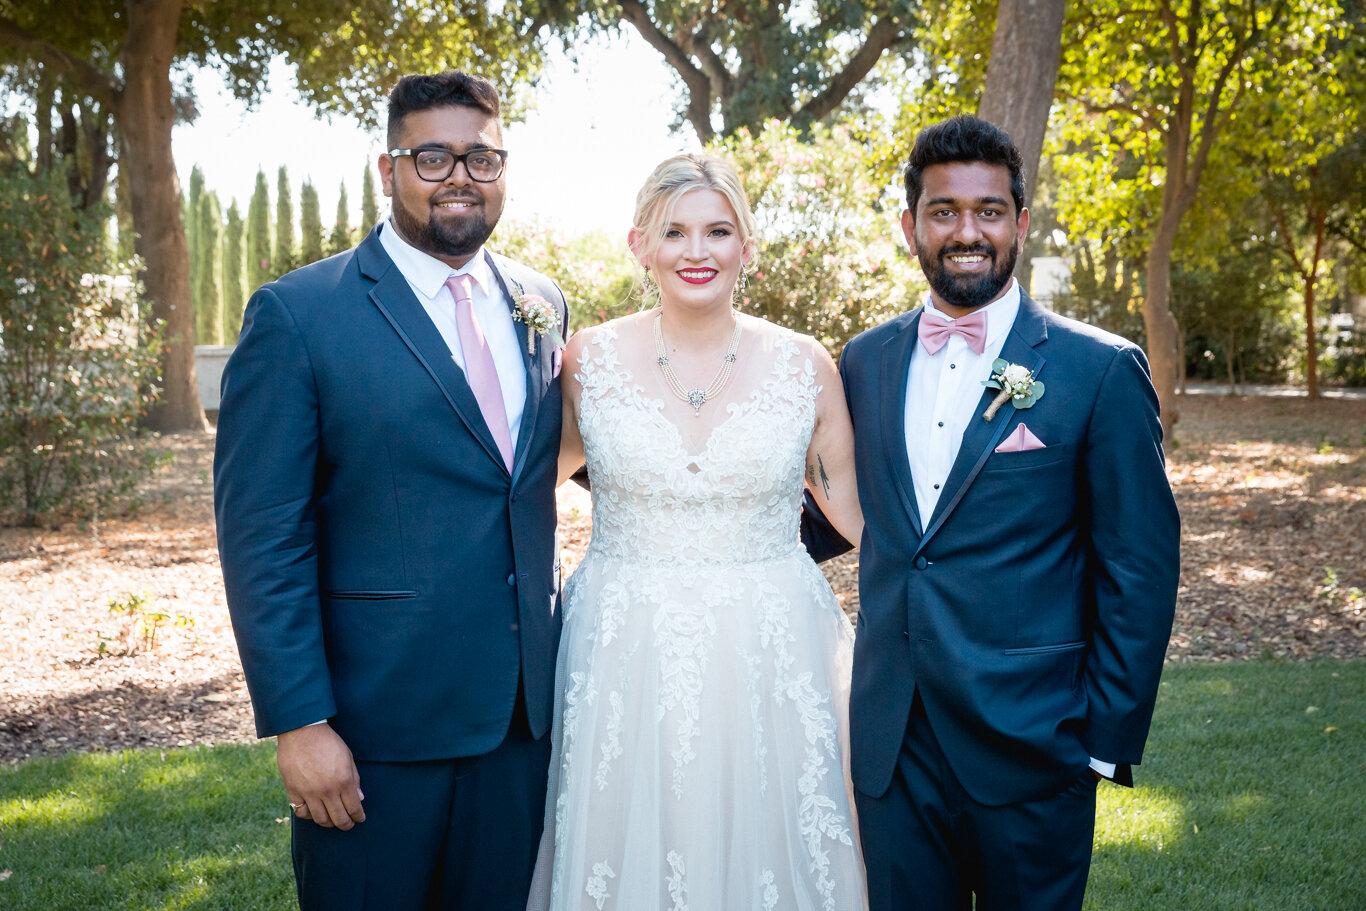 2019.08.24_Emily-Ashir-Wedding-at-the-Maples-5533.jpg